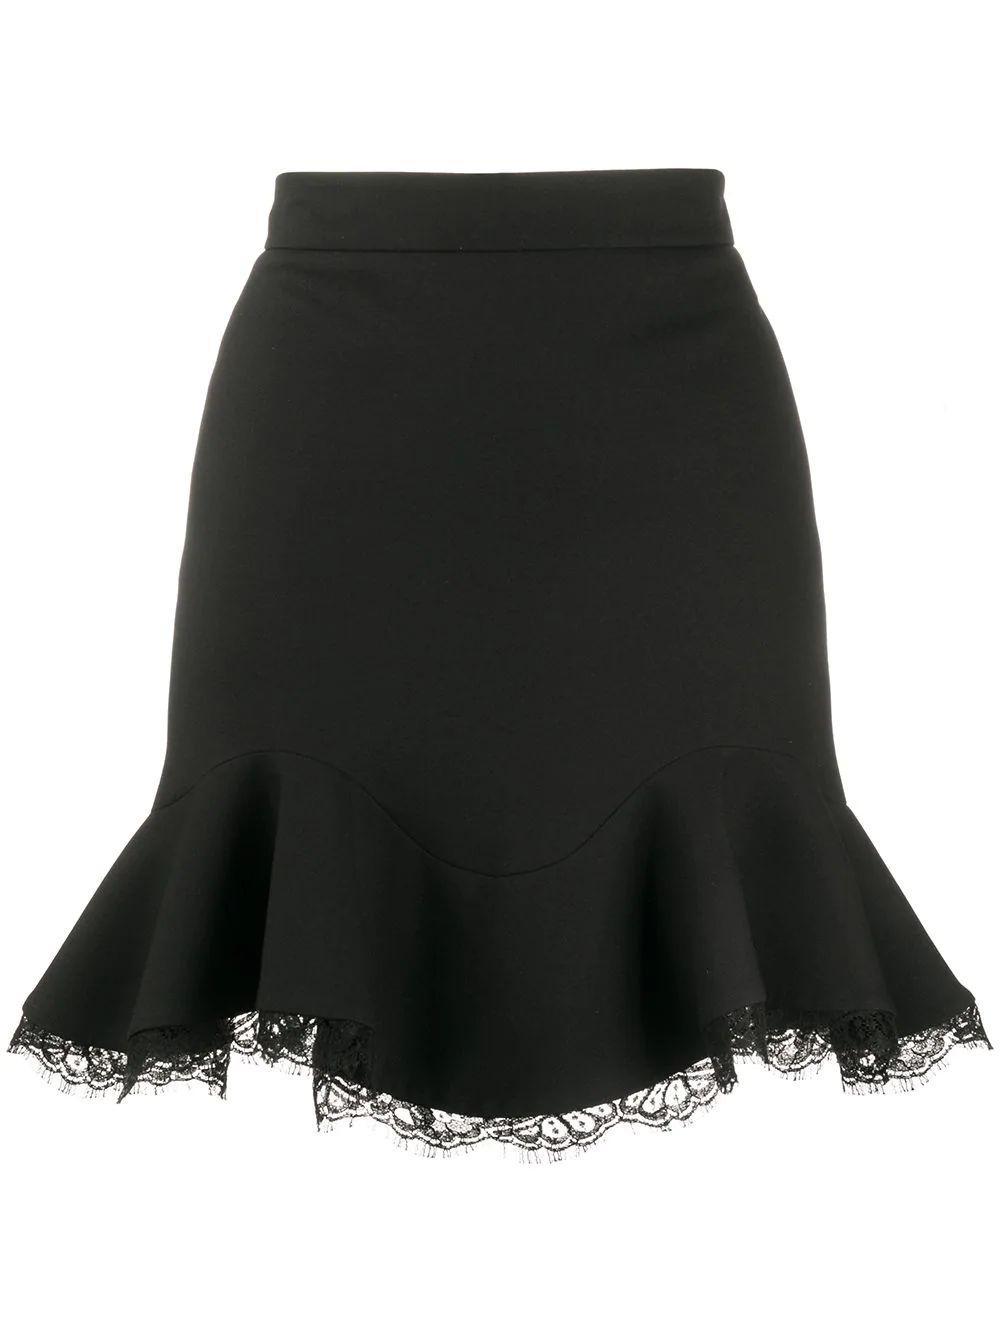 Lace Trim Flounce Skirt Item # 632258QJAAA